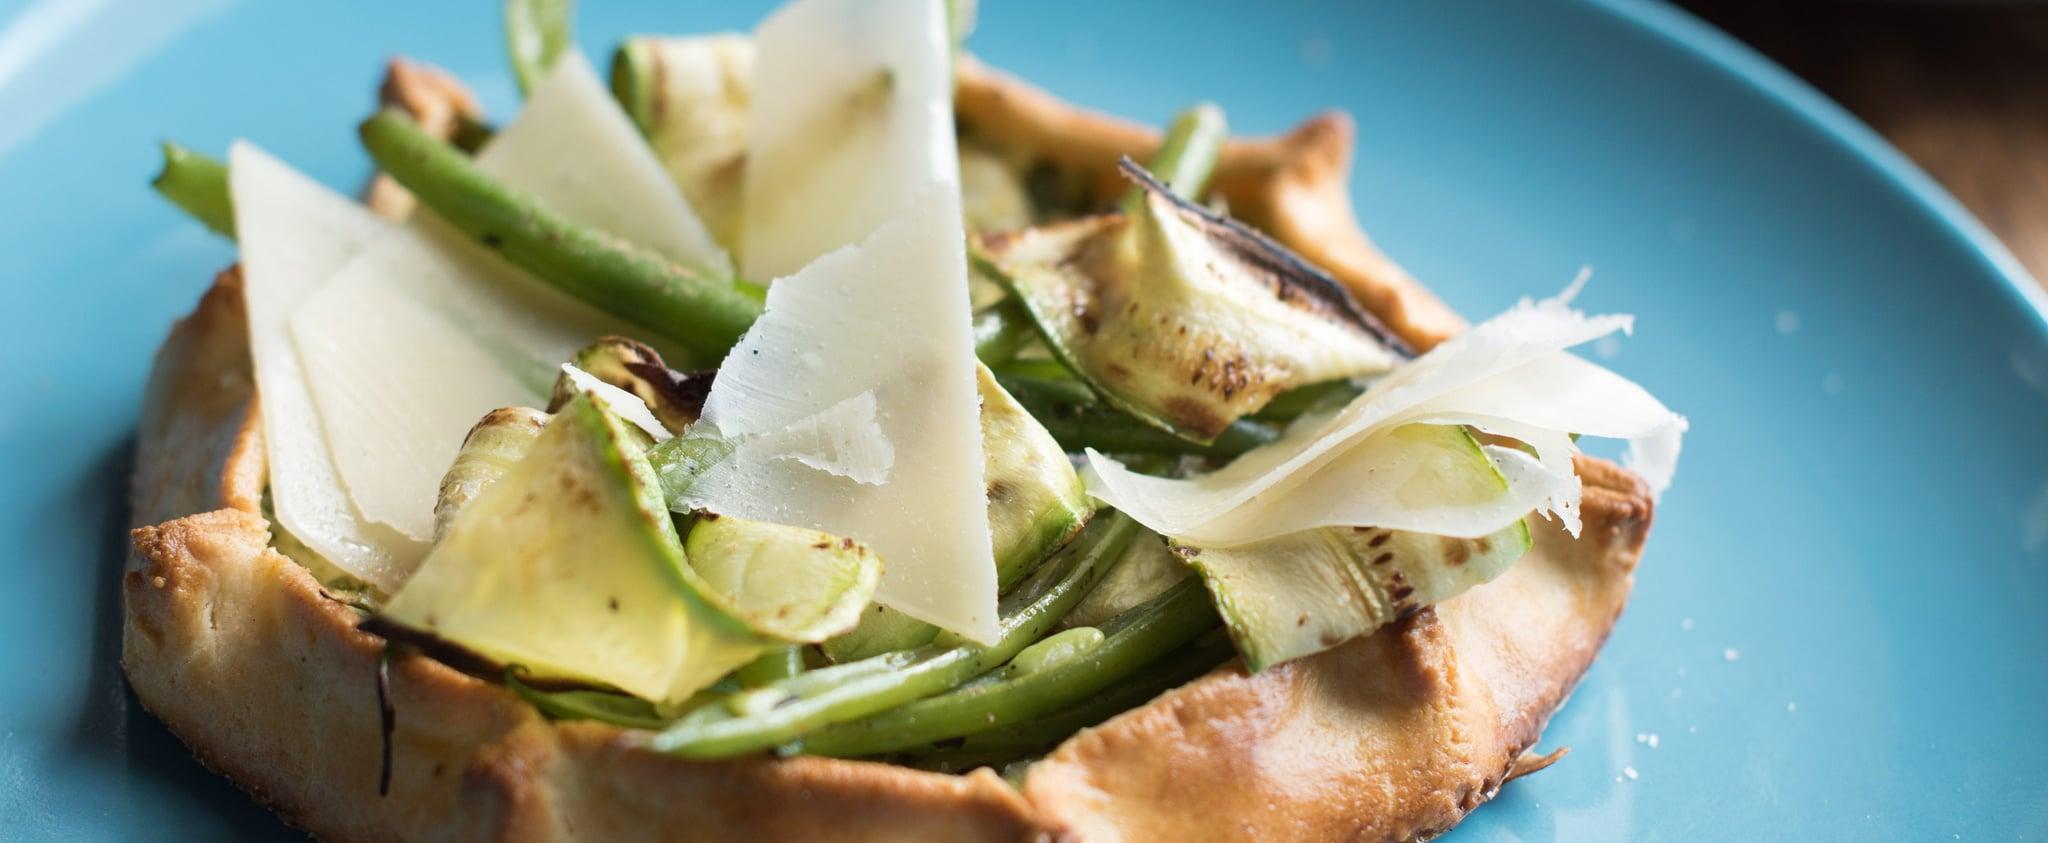 Green Vegetables & Ricotta Tart With Parmesan Crust